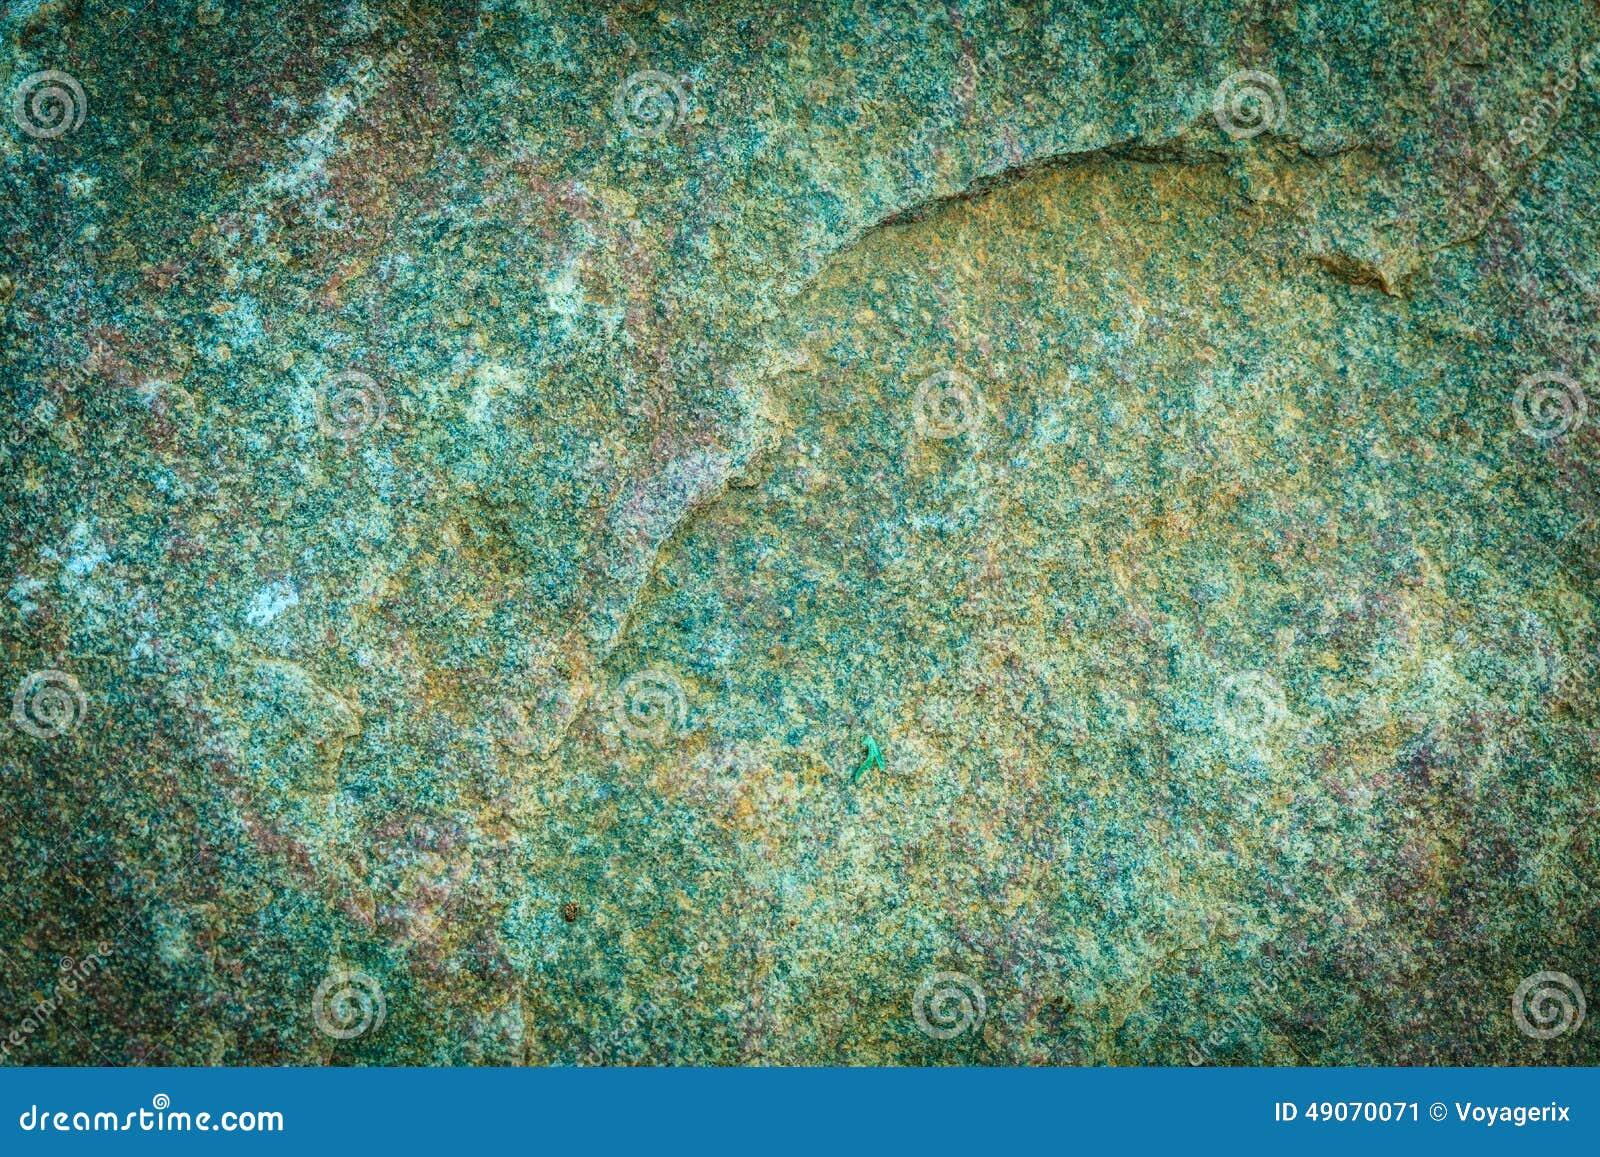 green grunge texture thumb - photo #32